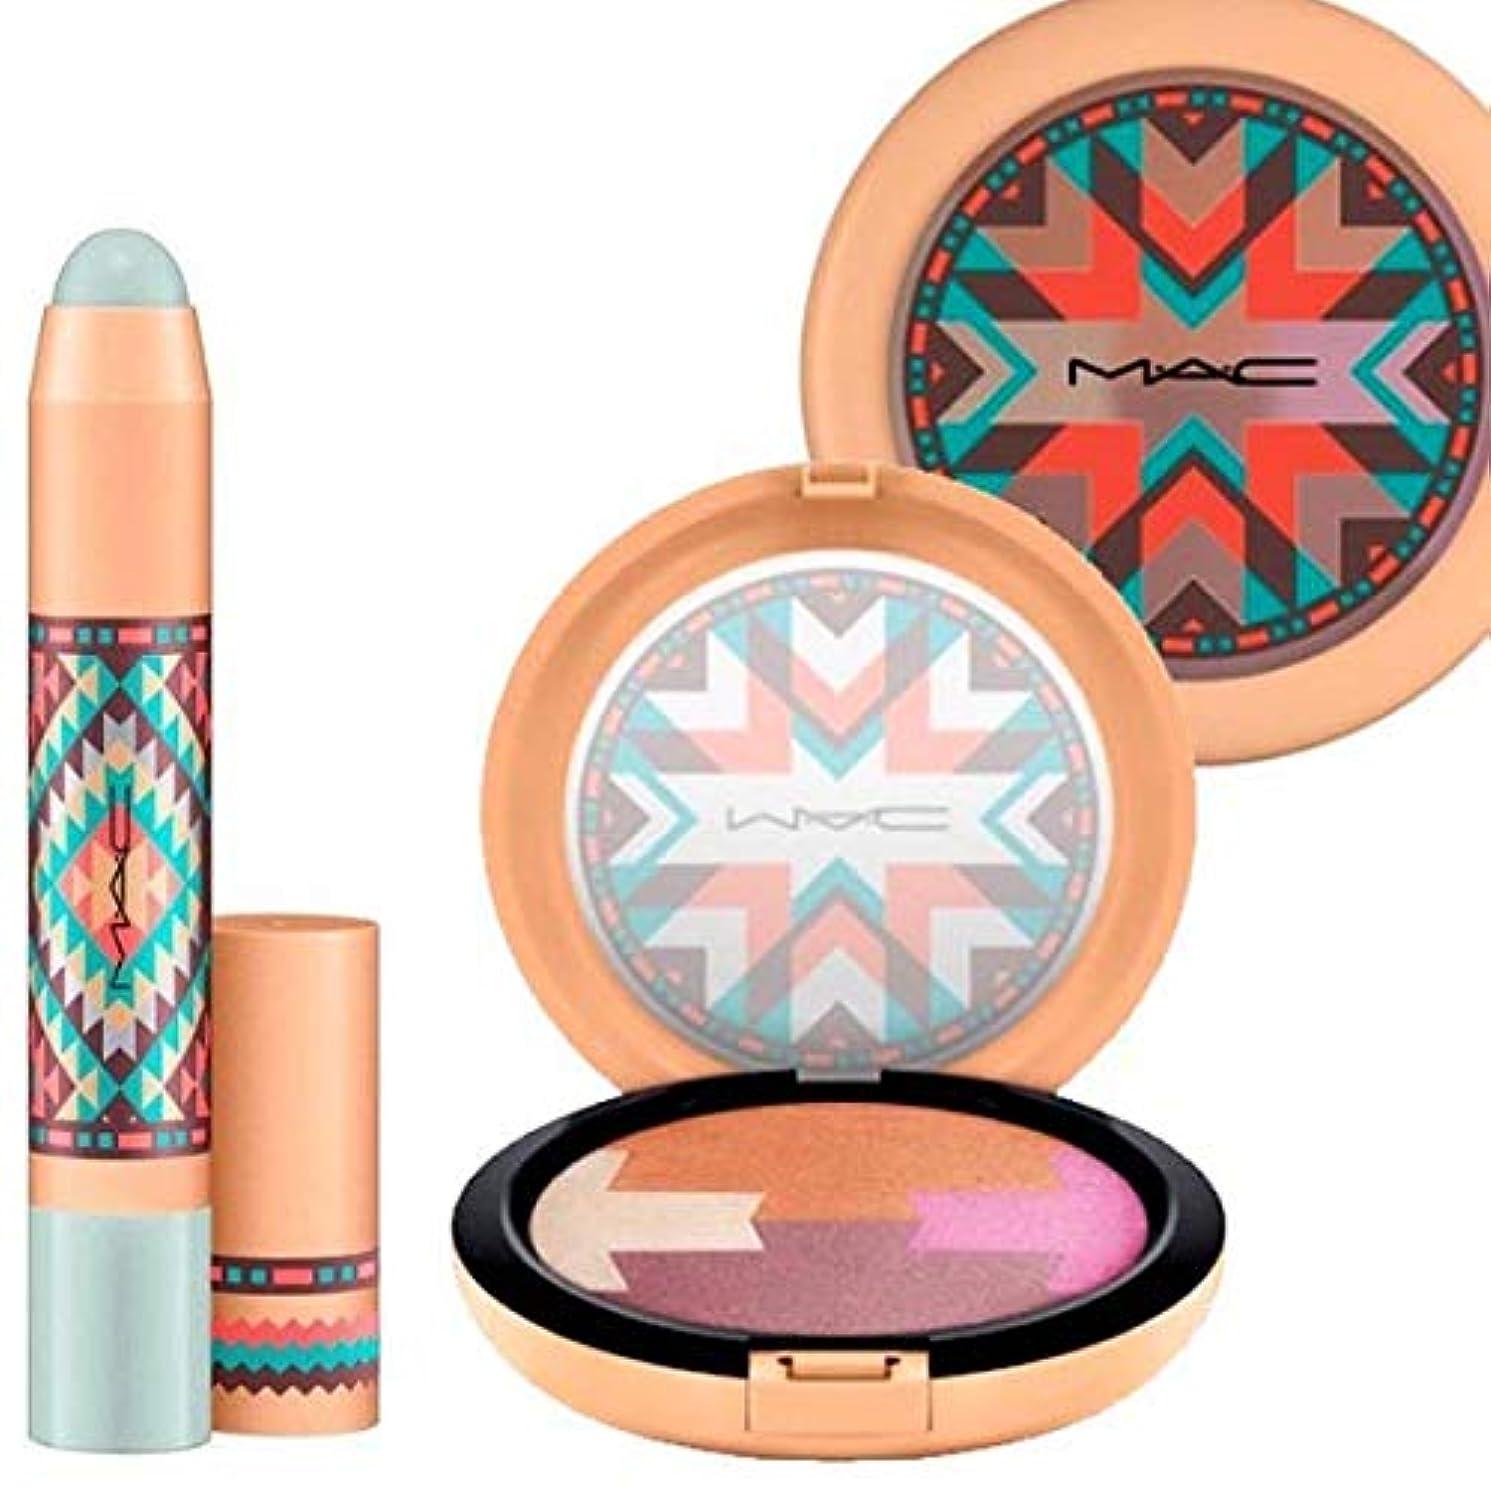 倉庫伝染病保全M.A.C ?マック, 限定版 !!! Vibe Tribe/Gleamtones Powder & Desert Evening Lip Pencil [海外直送品] [並行輸入品]